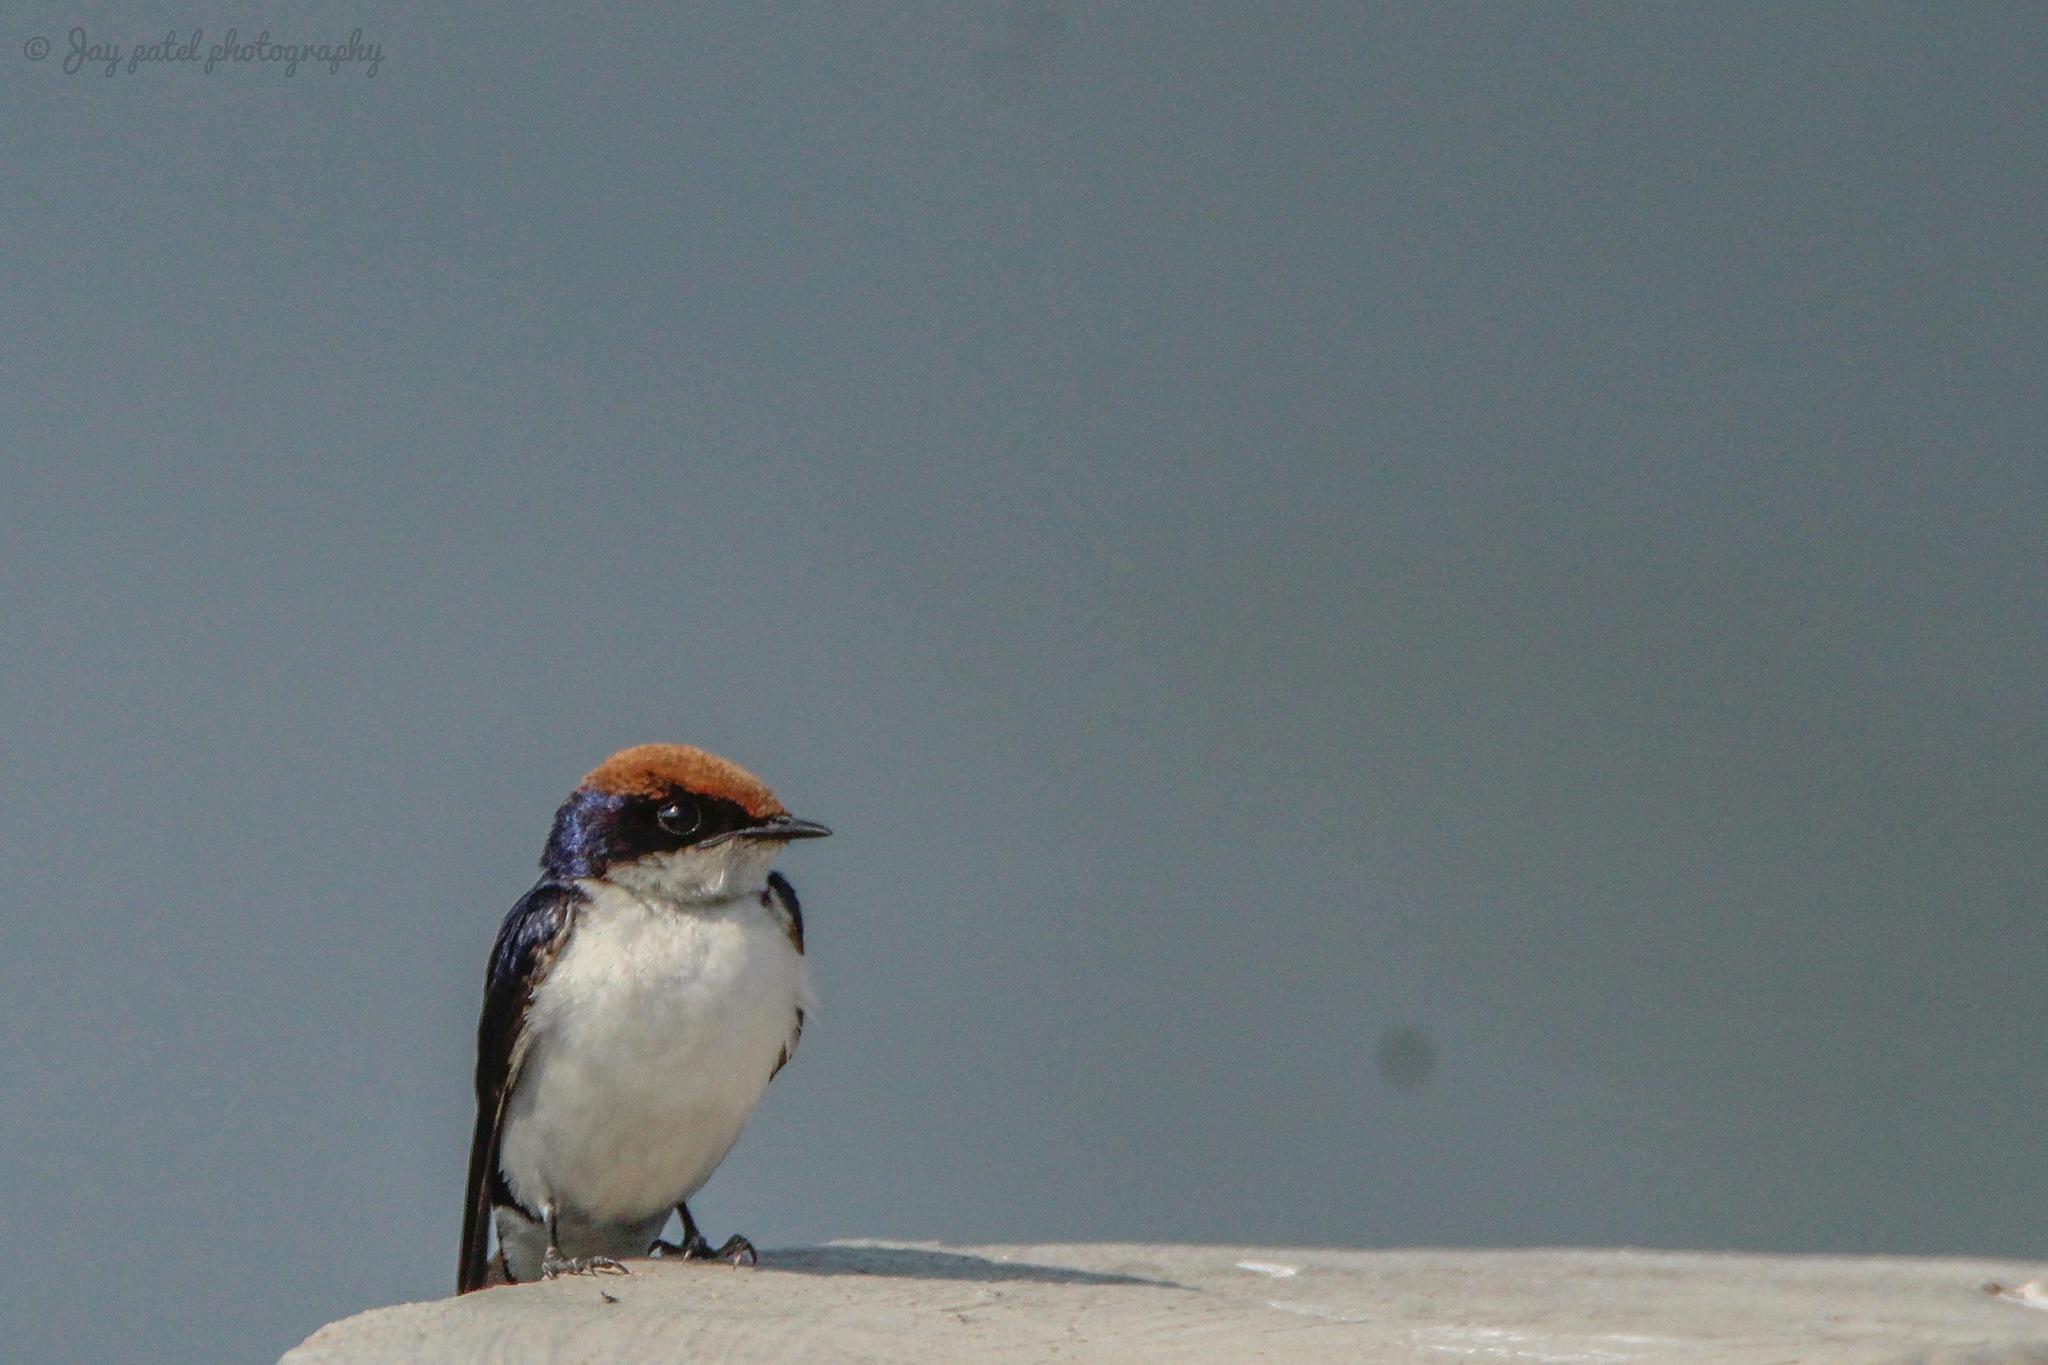 Wire-tailed swallow (Hirundo smithii) Gujarati Name : તારો઼ડિયું, તારપુચ્છ. by Jay Patel